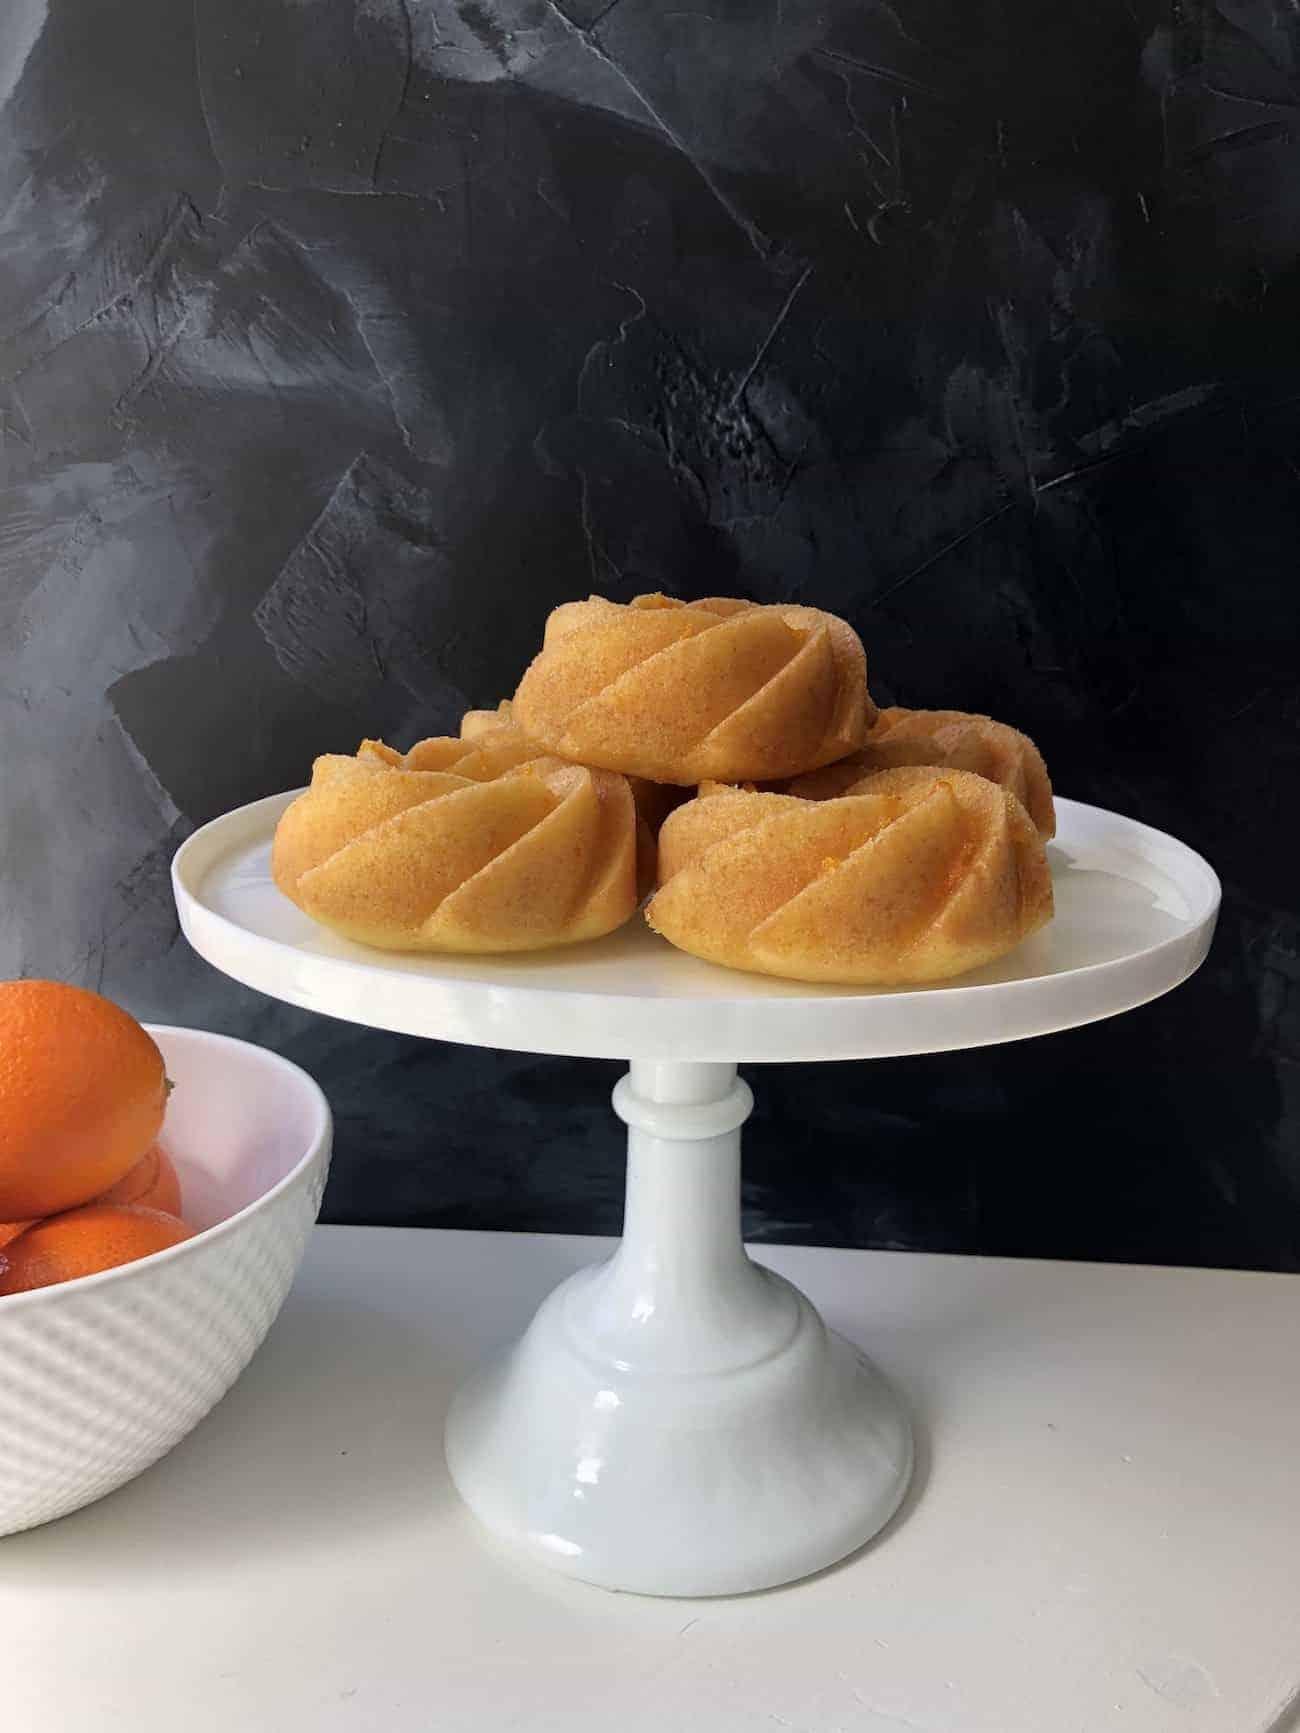 Orange Bundtlette Cakes on Cake Stand with Bowl of Oranges